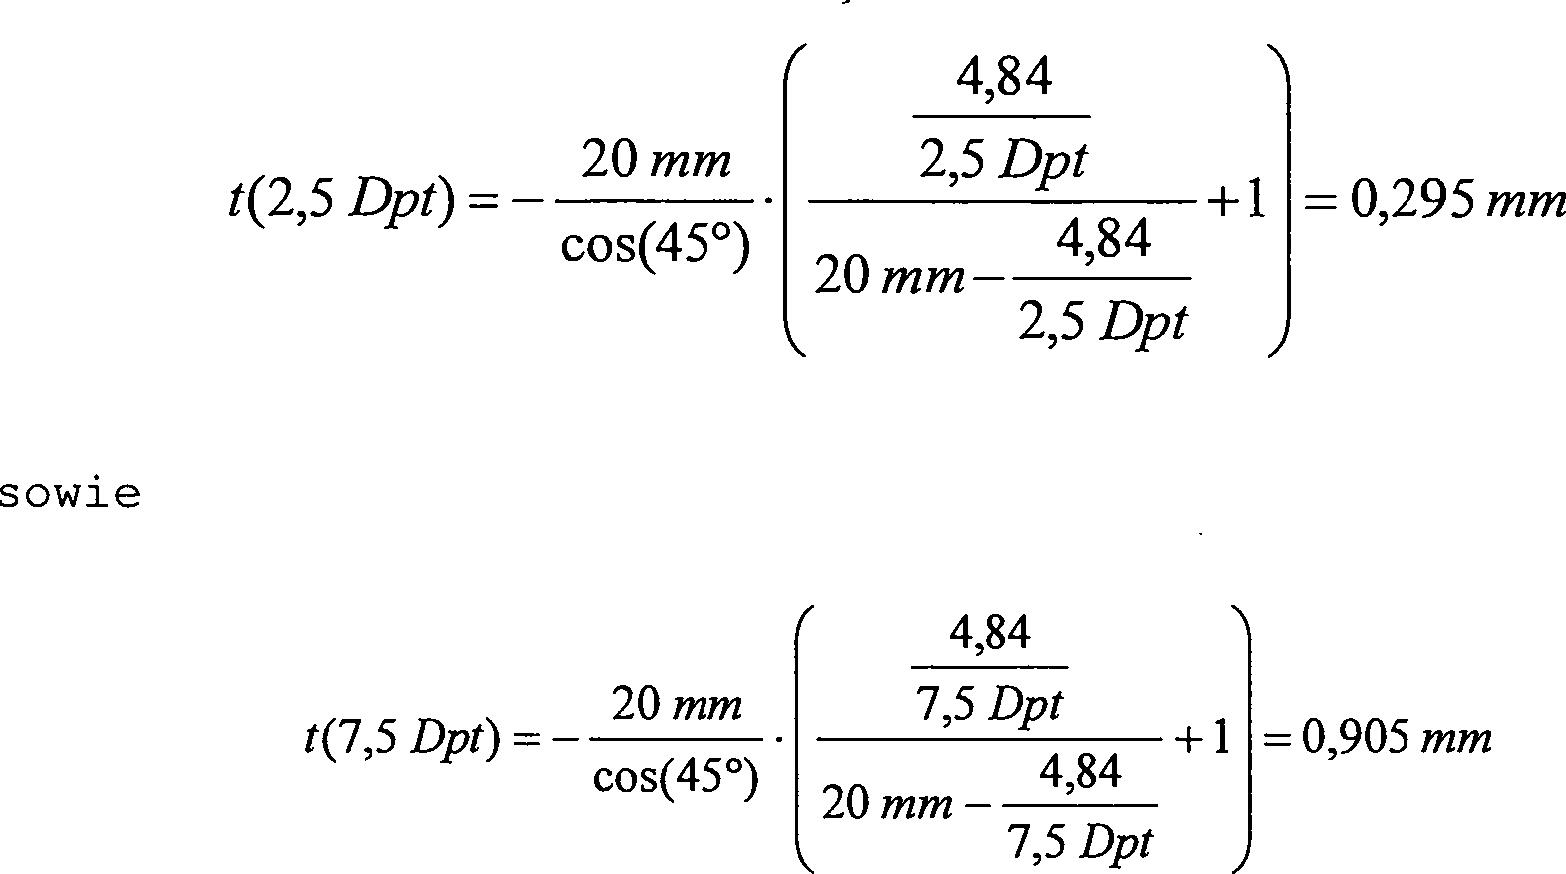 DE102013021974B3 - Apparatus for determining an ametropia of an eye